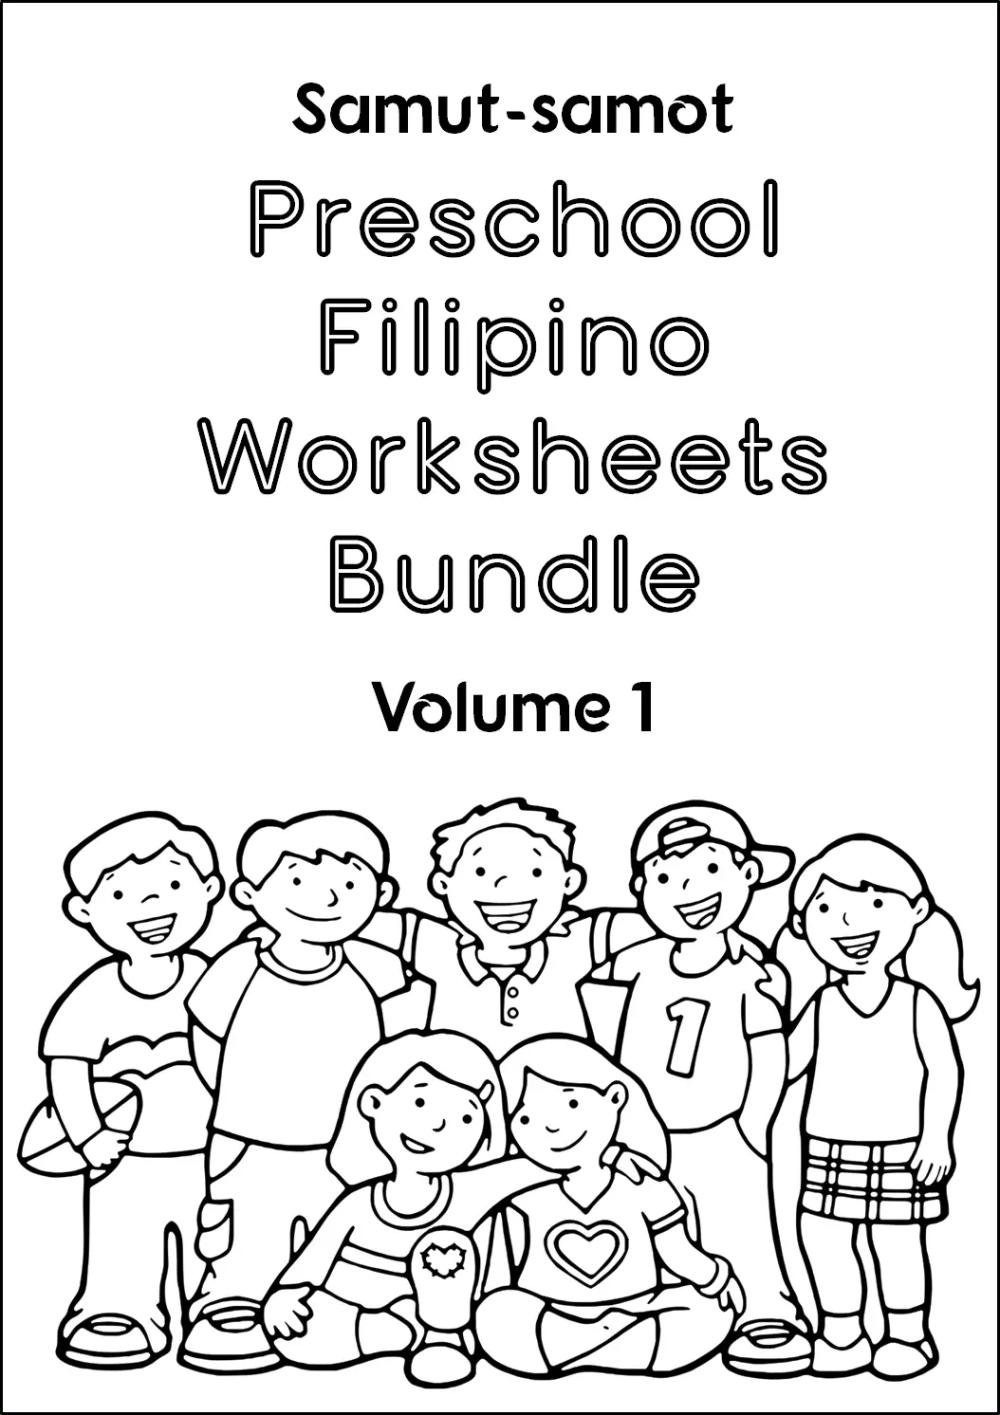 medium resolution of Preschool Filipino Worksheets Bundle Vol. 1 - Samut-samot